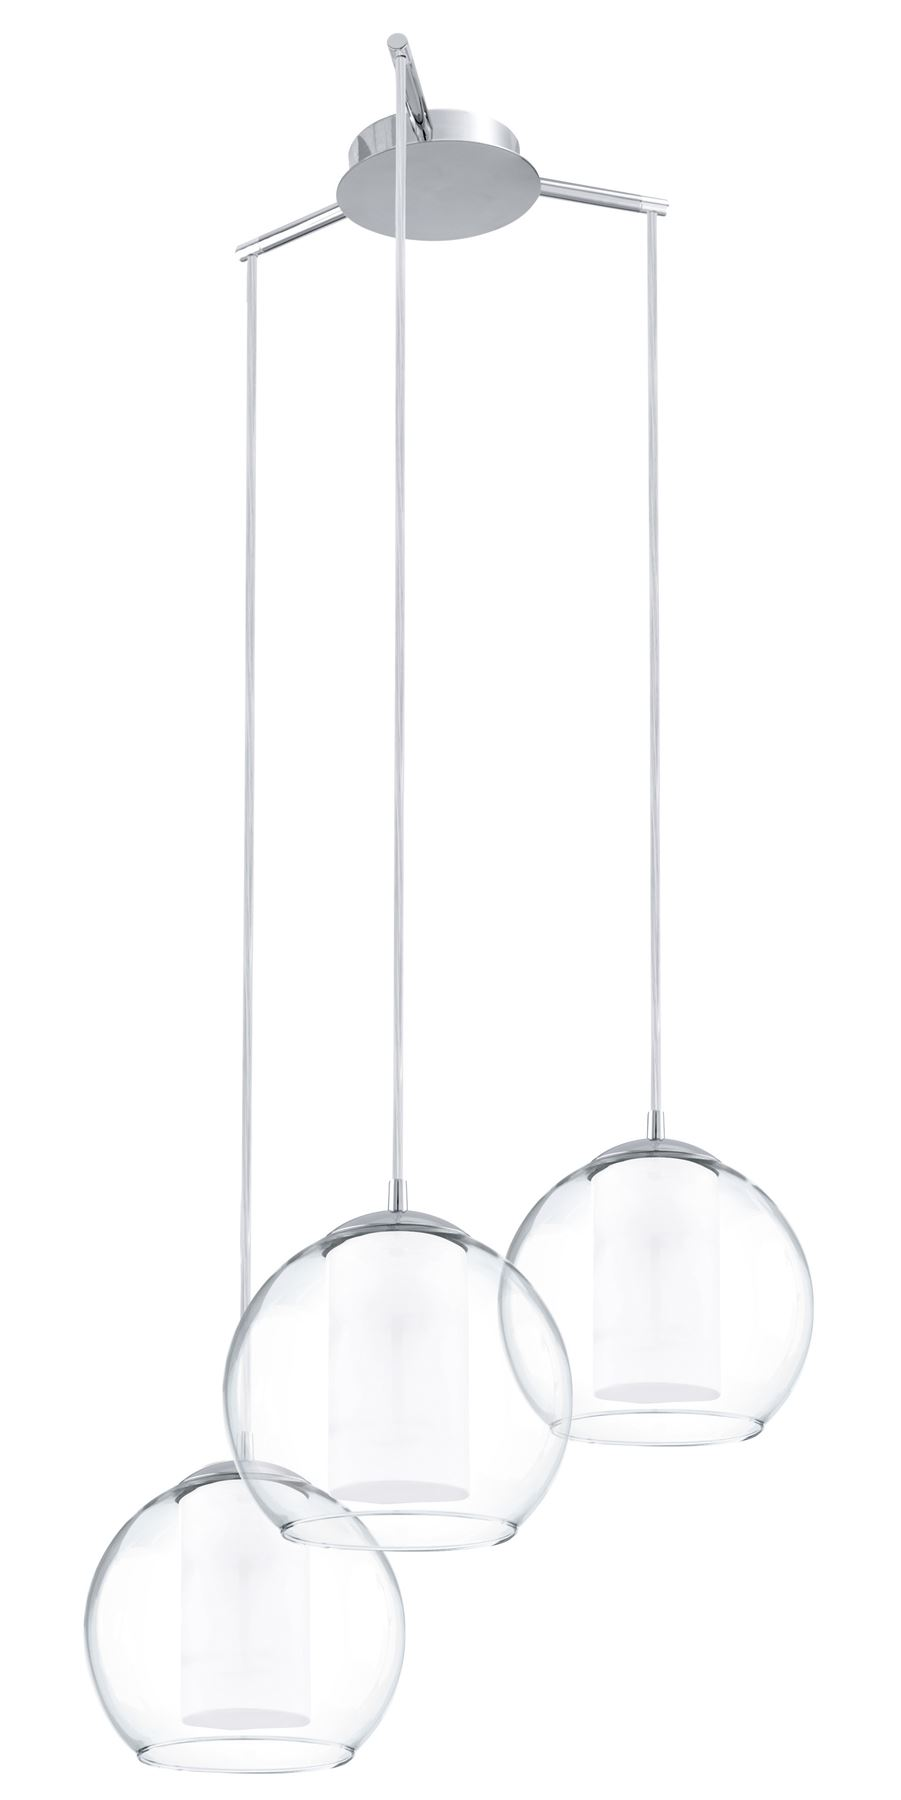 Bolsano Hanging Pendant 3 Lights E27 Steel Chrome White Clear